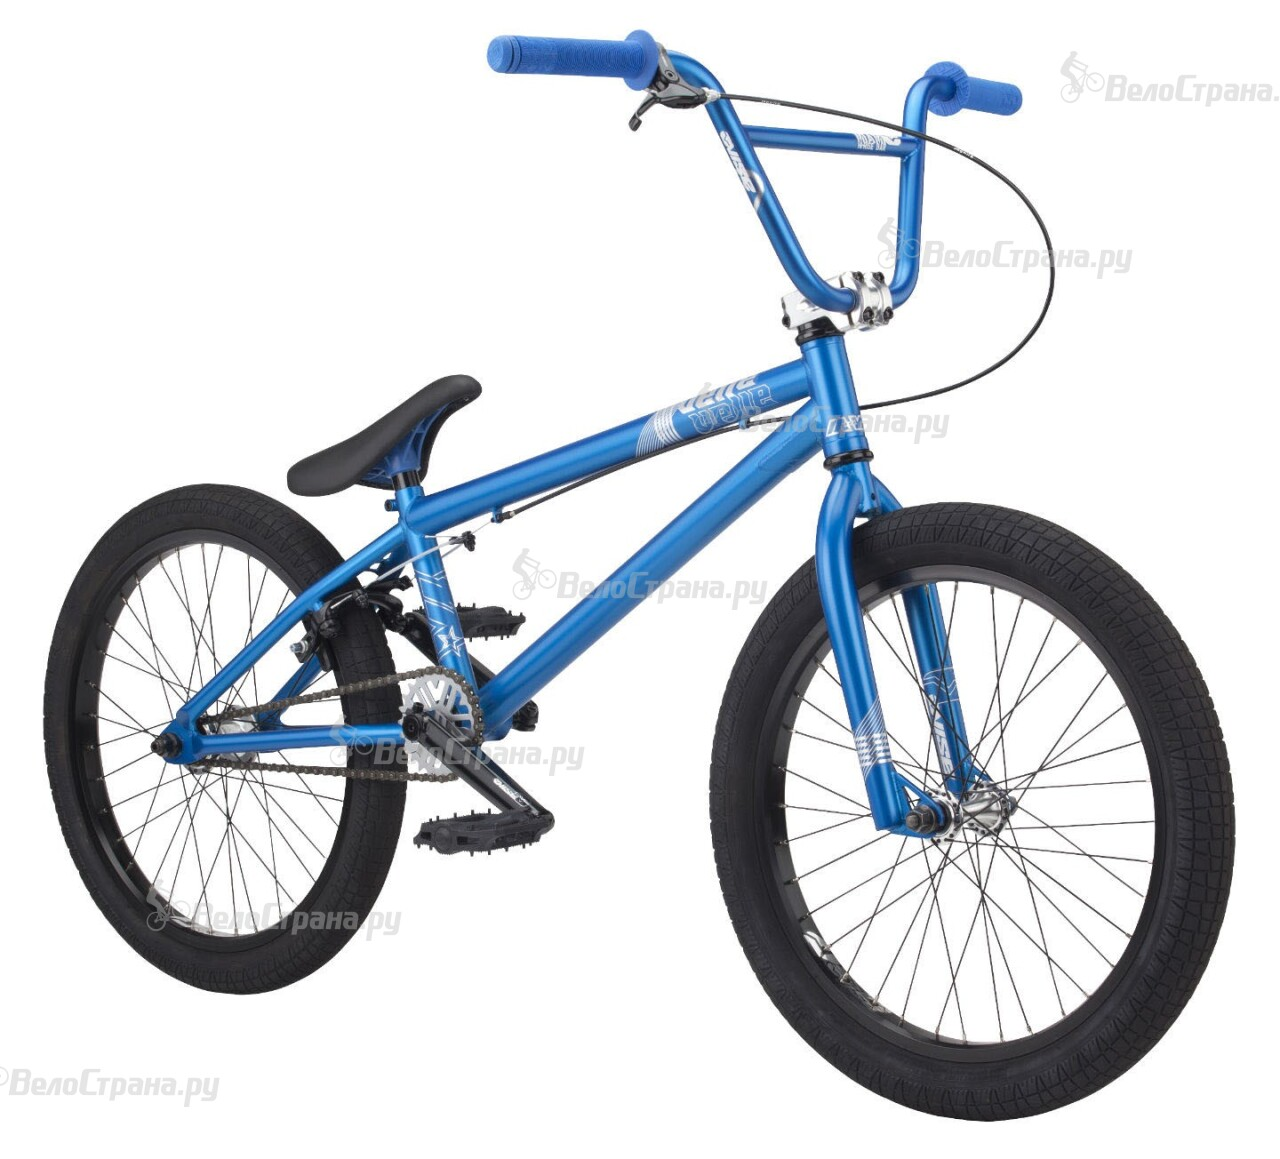 Велосипед Forward 4212 (2013) велосипед forward valencia 401 2013